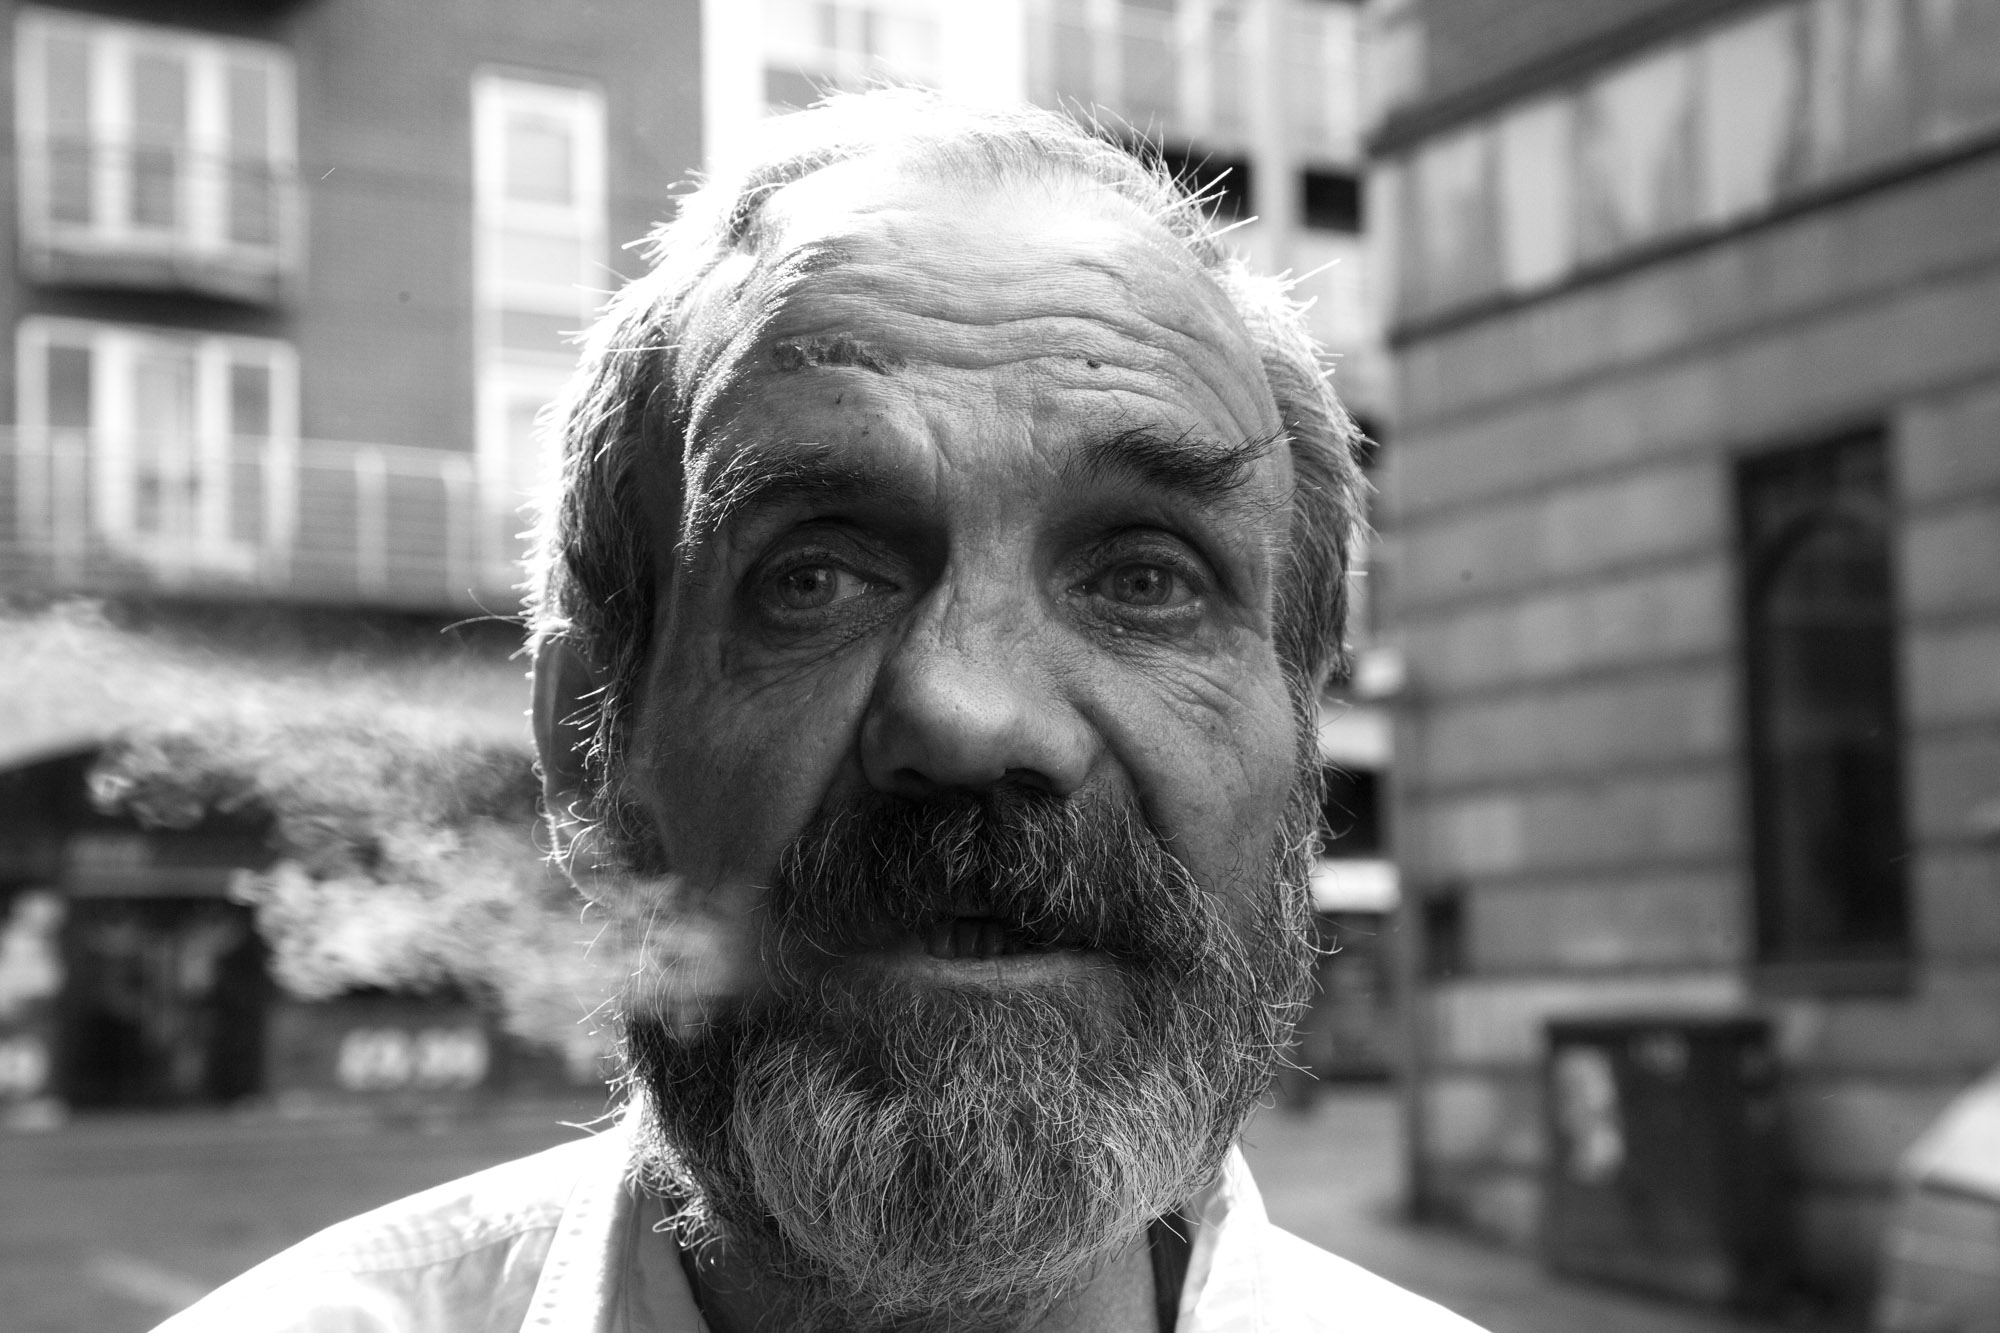 portraits-photographer-oxford-london-jonathan-self-photography_-2.jpg